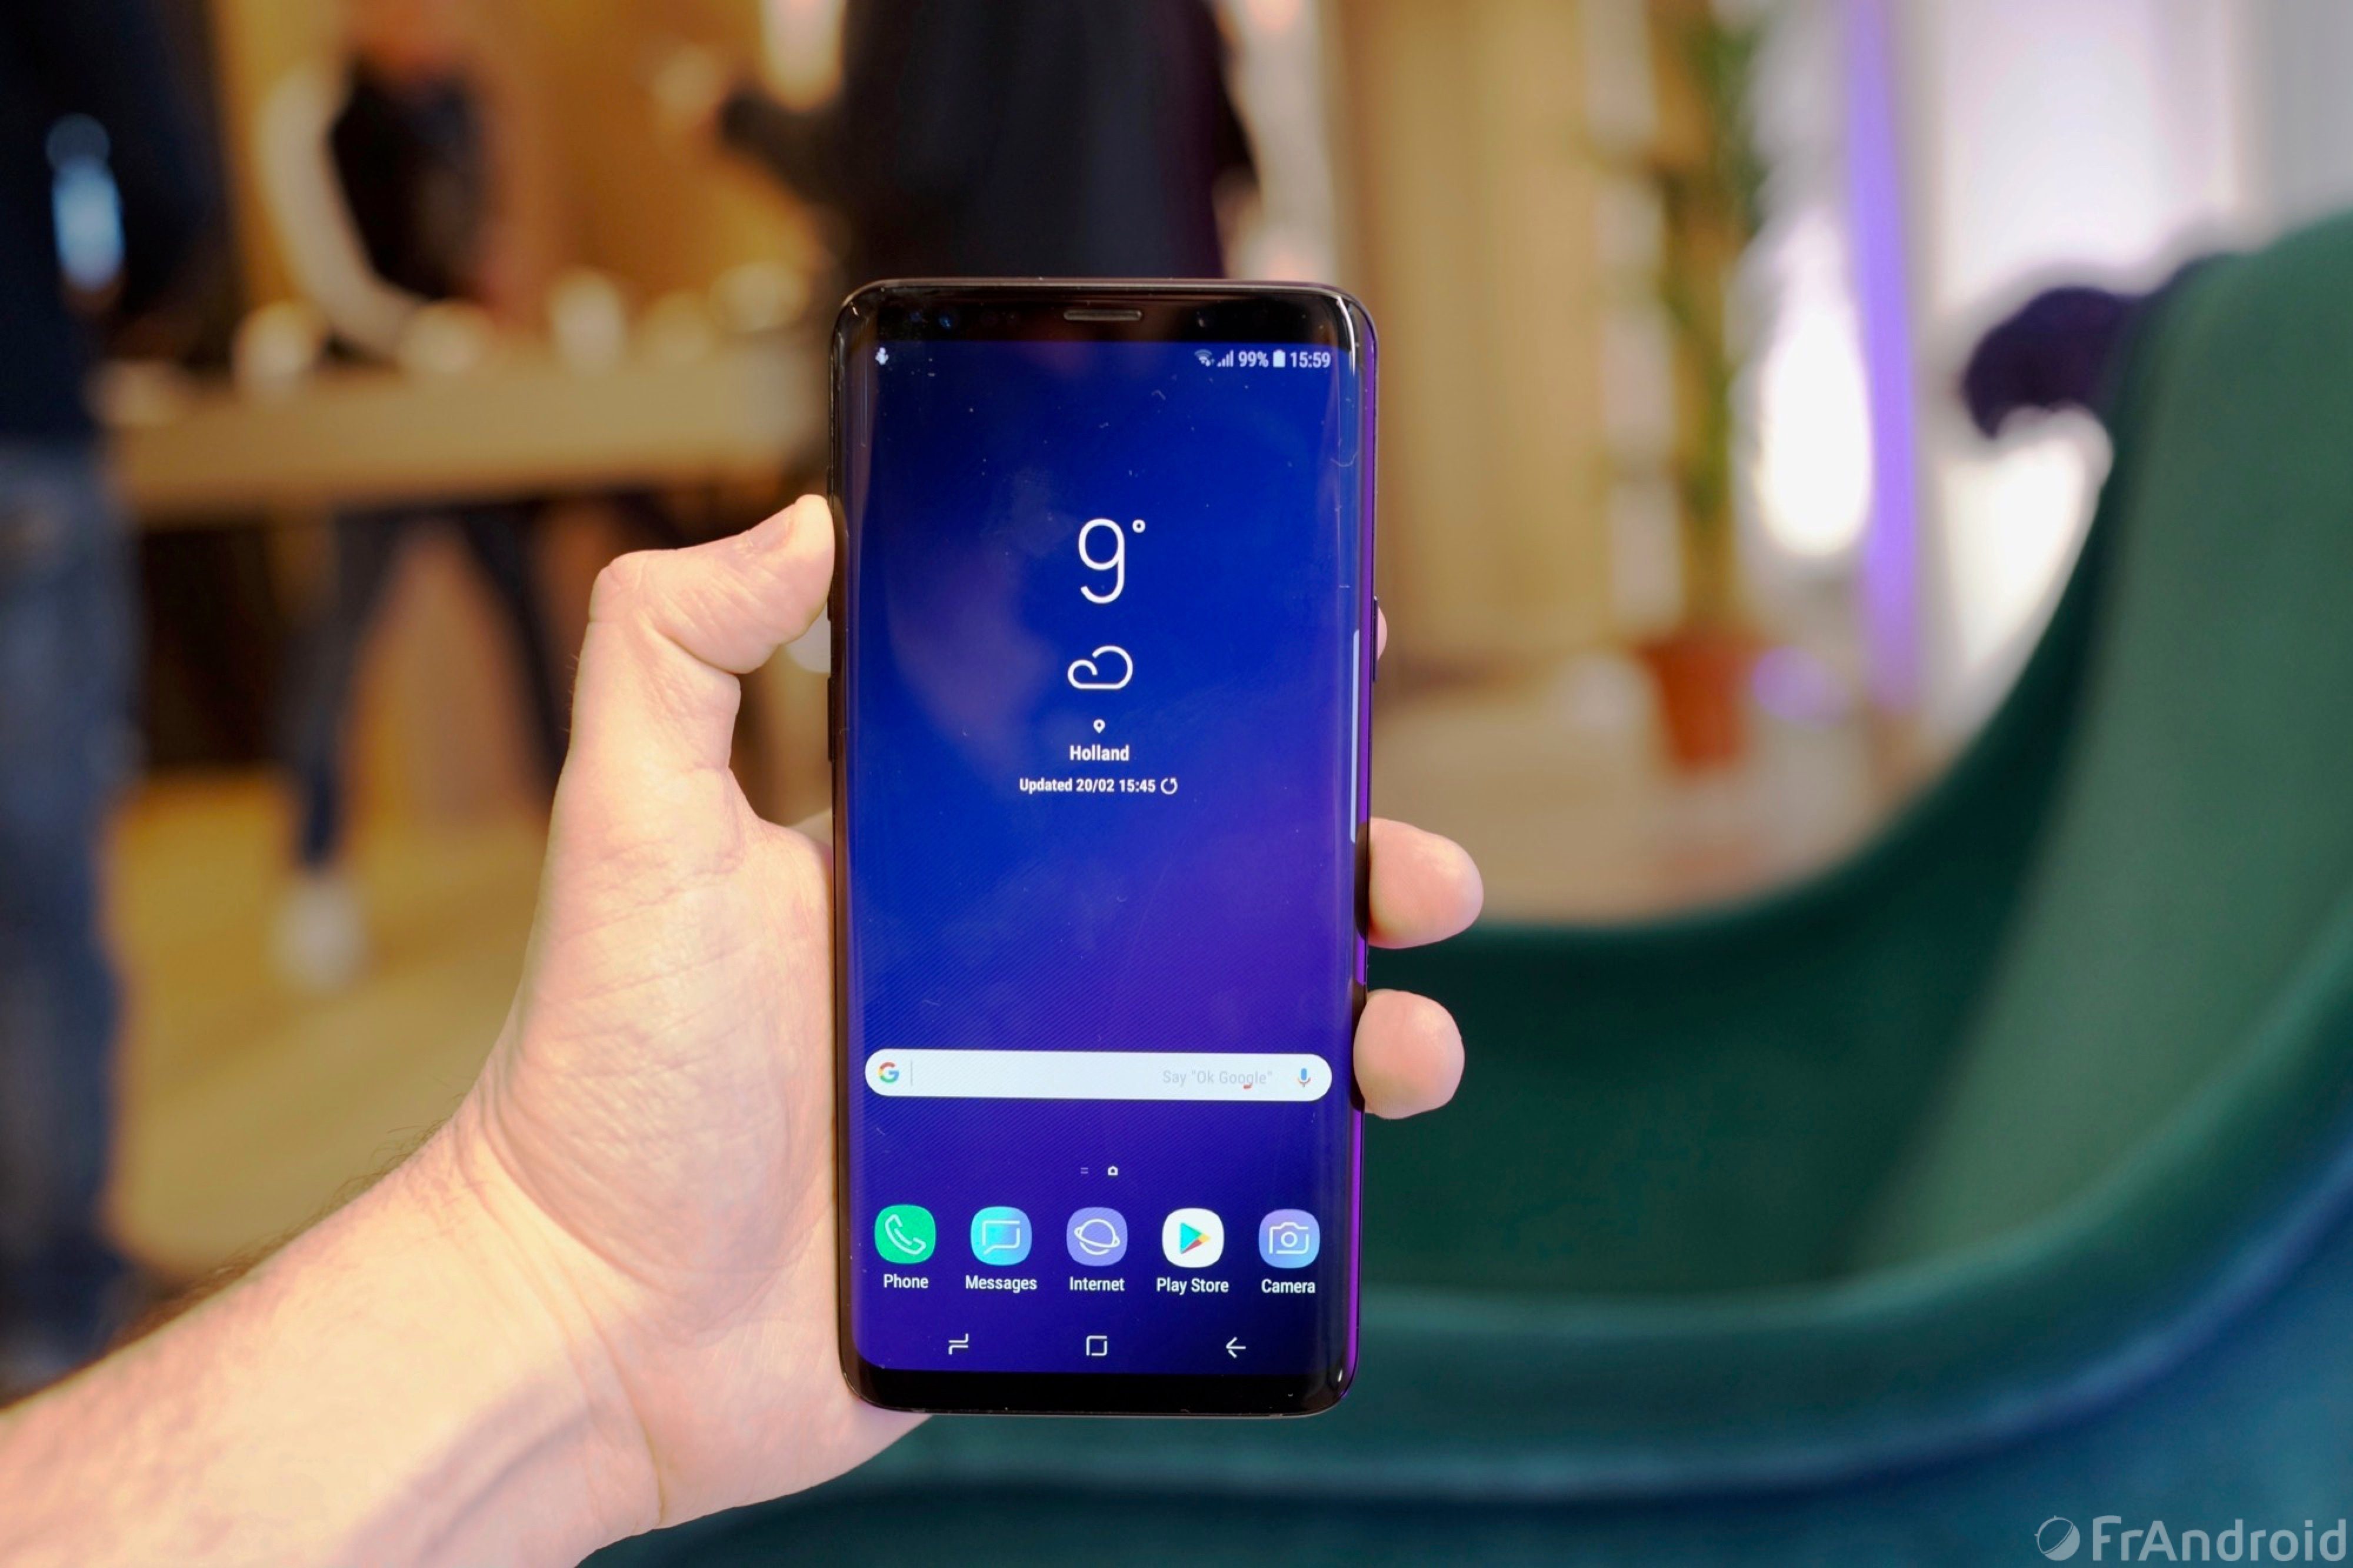 Prise en main du Samsung Galaxy S9 et du Galaxy S9+ - FrAndroid 9a513219df20